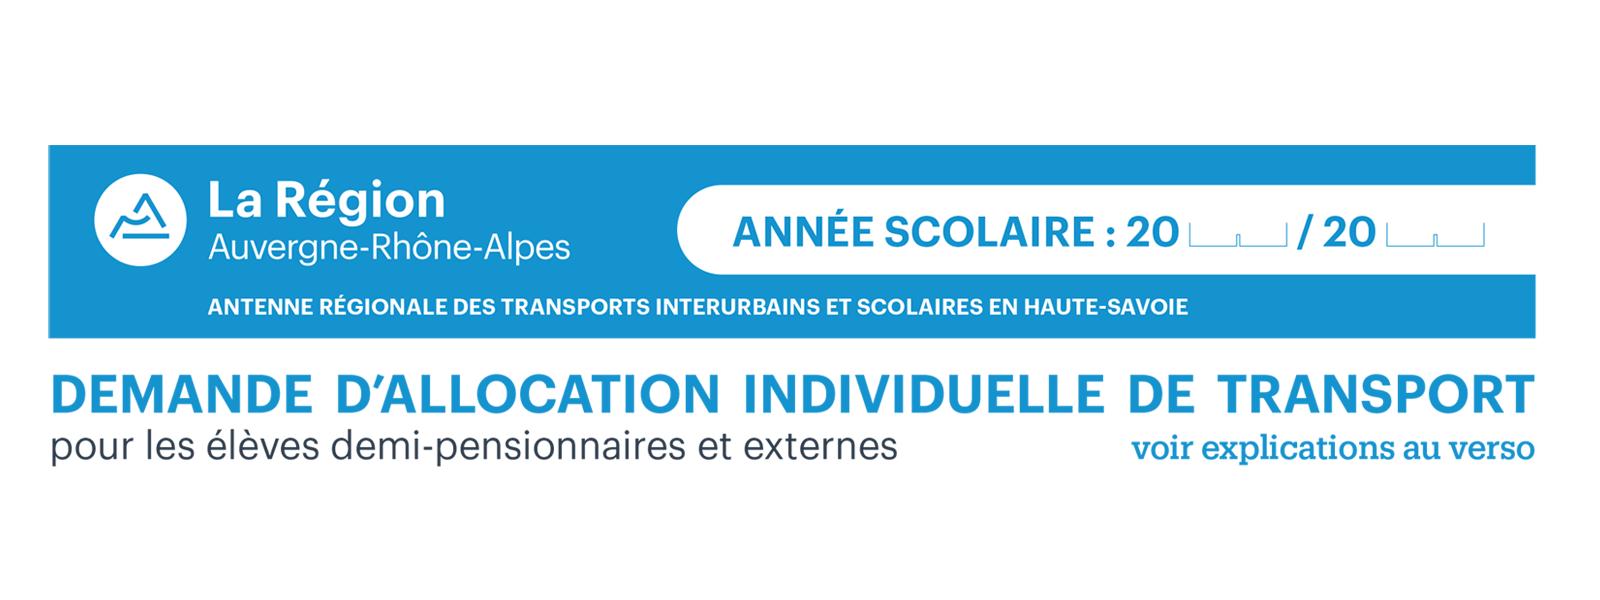 Allocation individuelle de transport 2019/2020